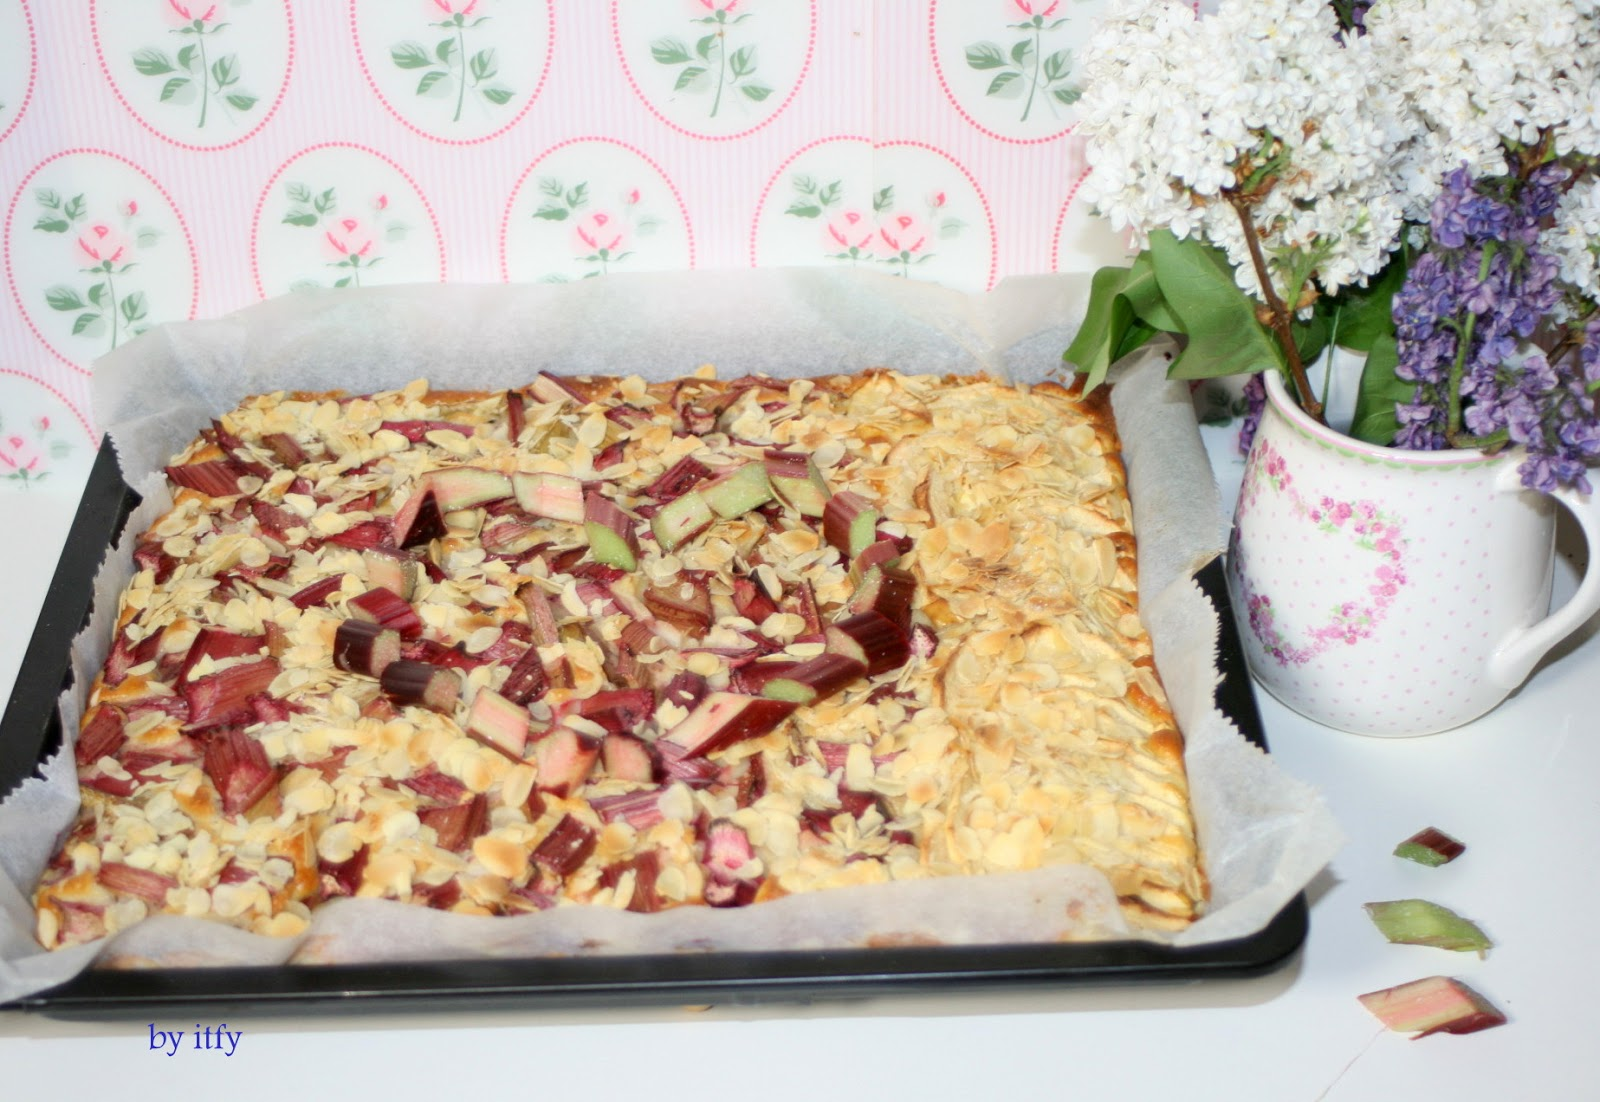 I Test For You Sonntagskuchen Rhabarber Blechkuchen Mit Quark